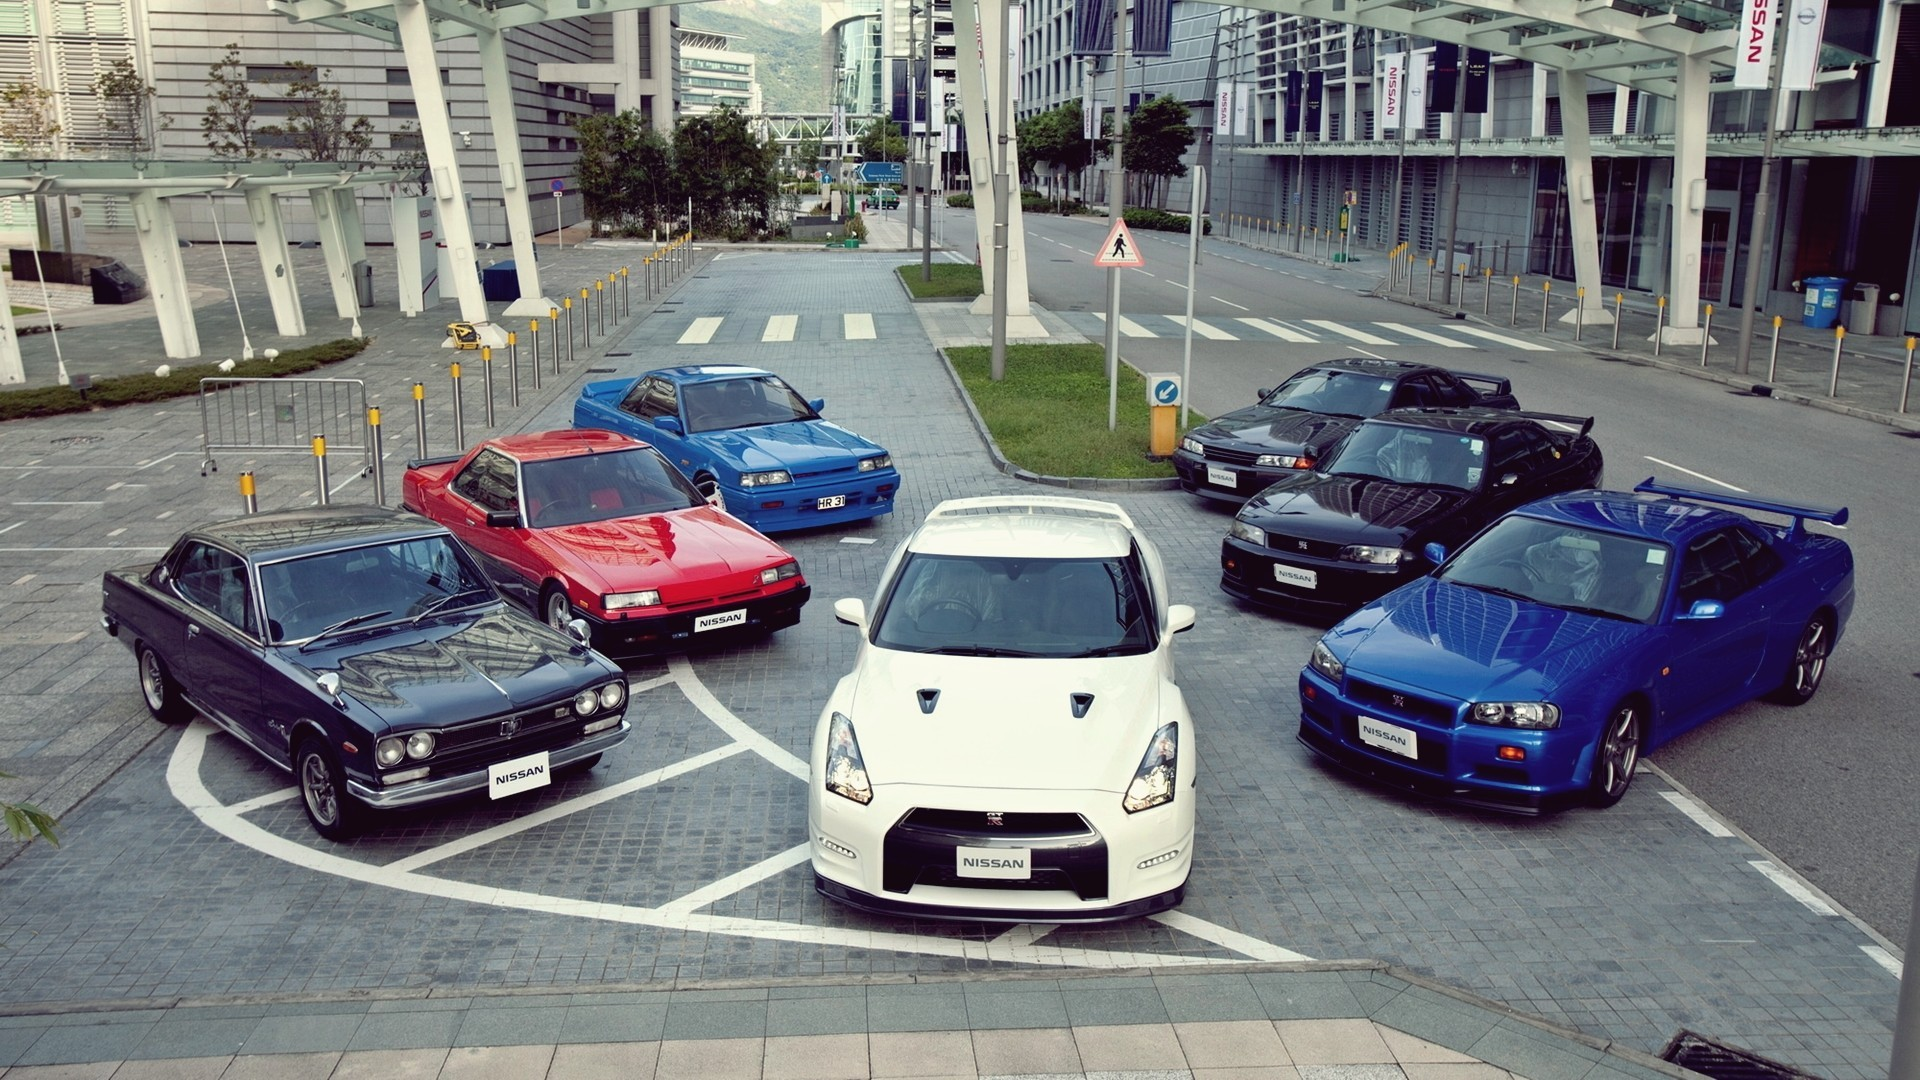 General 1920x1080 Nissan Nissan Skyline Nissan GT-R R32 Nissan Skyline GT-R R33 Nissan Skyline GT-R R34 Nissan GTR car Japanese cars vehicle white cars blue cars red cars cityscape Nissan Skyline C10